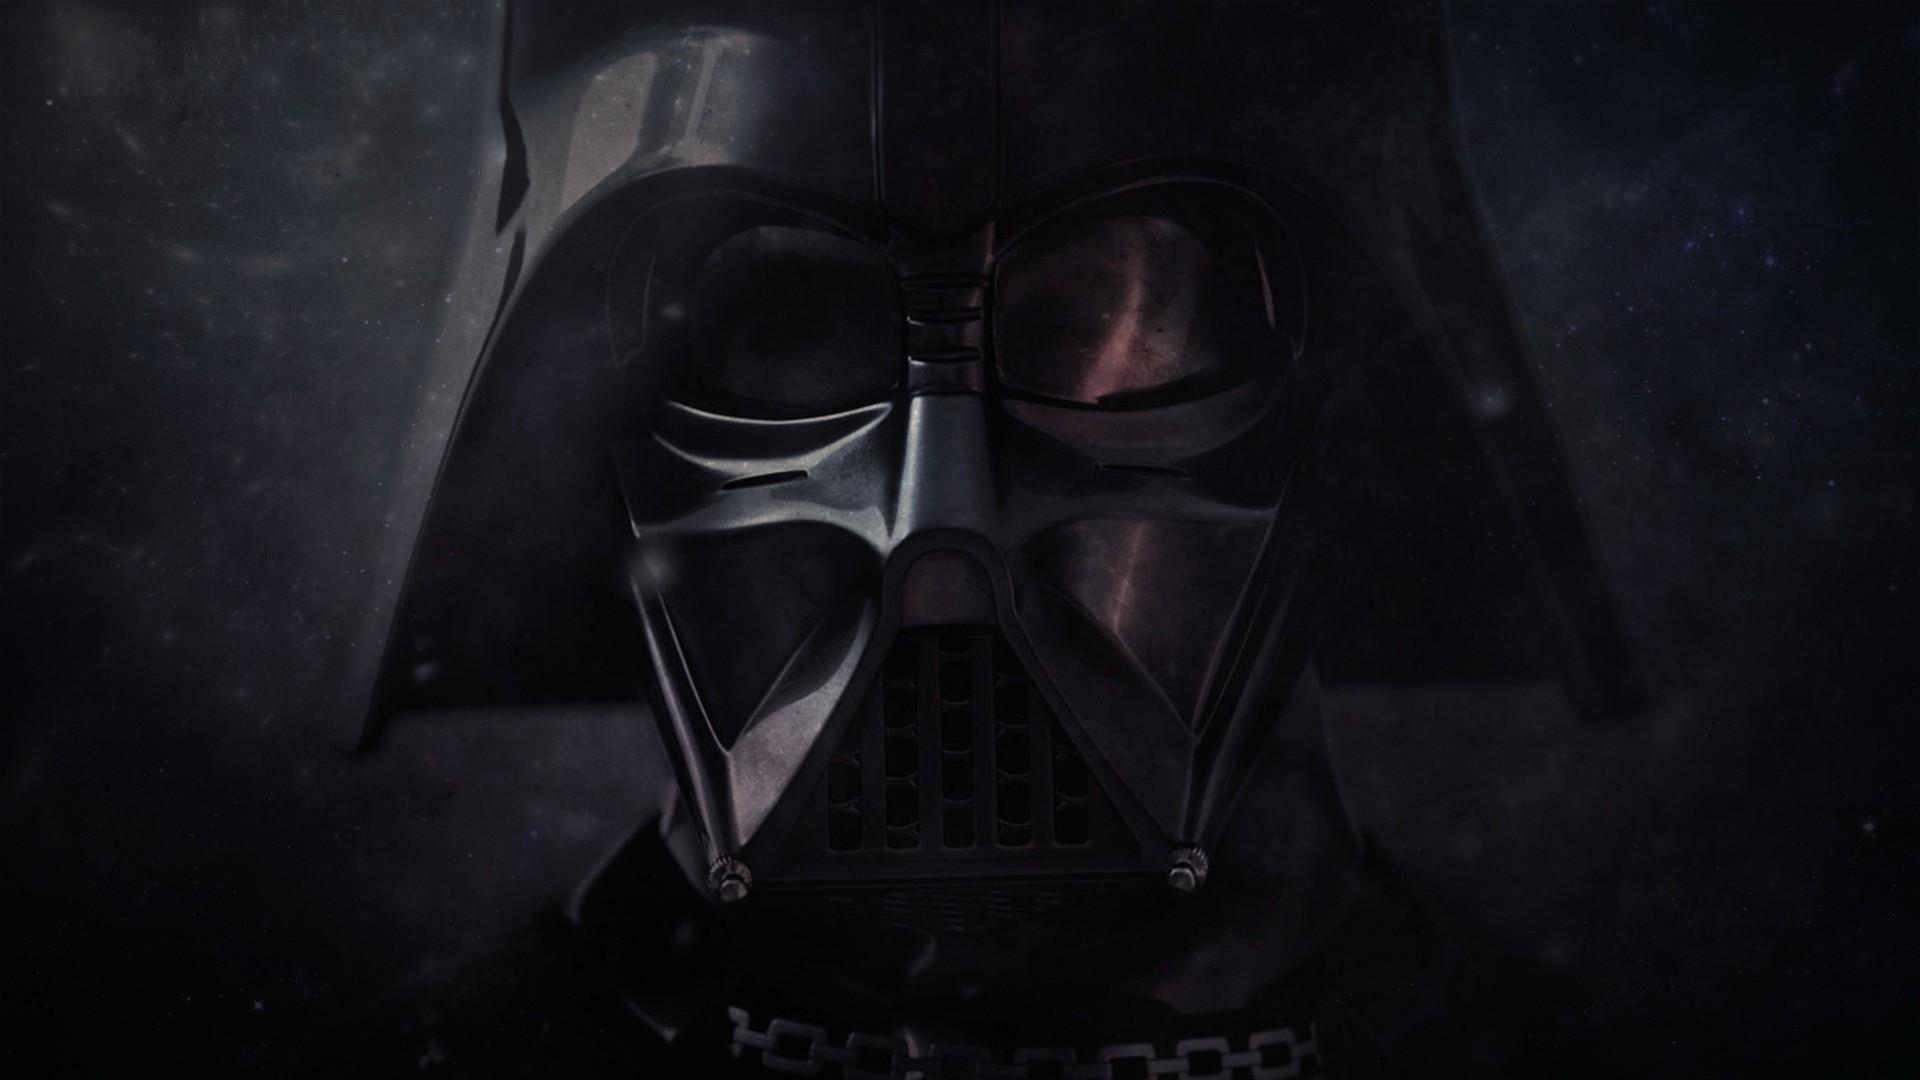 Sci Fi – Star Wars Darth Vader Sith (Star Wars) Wallpaper